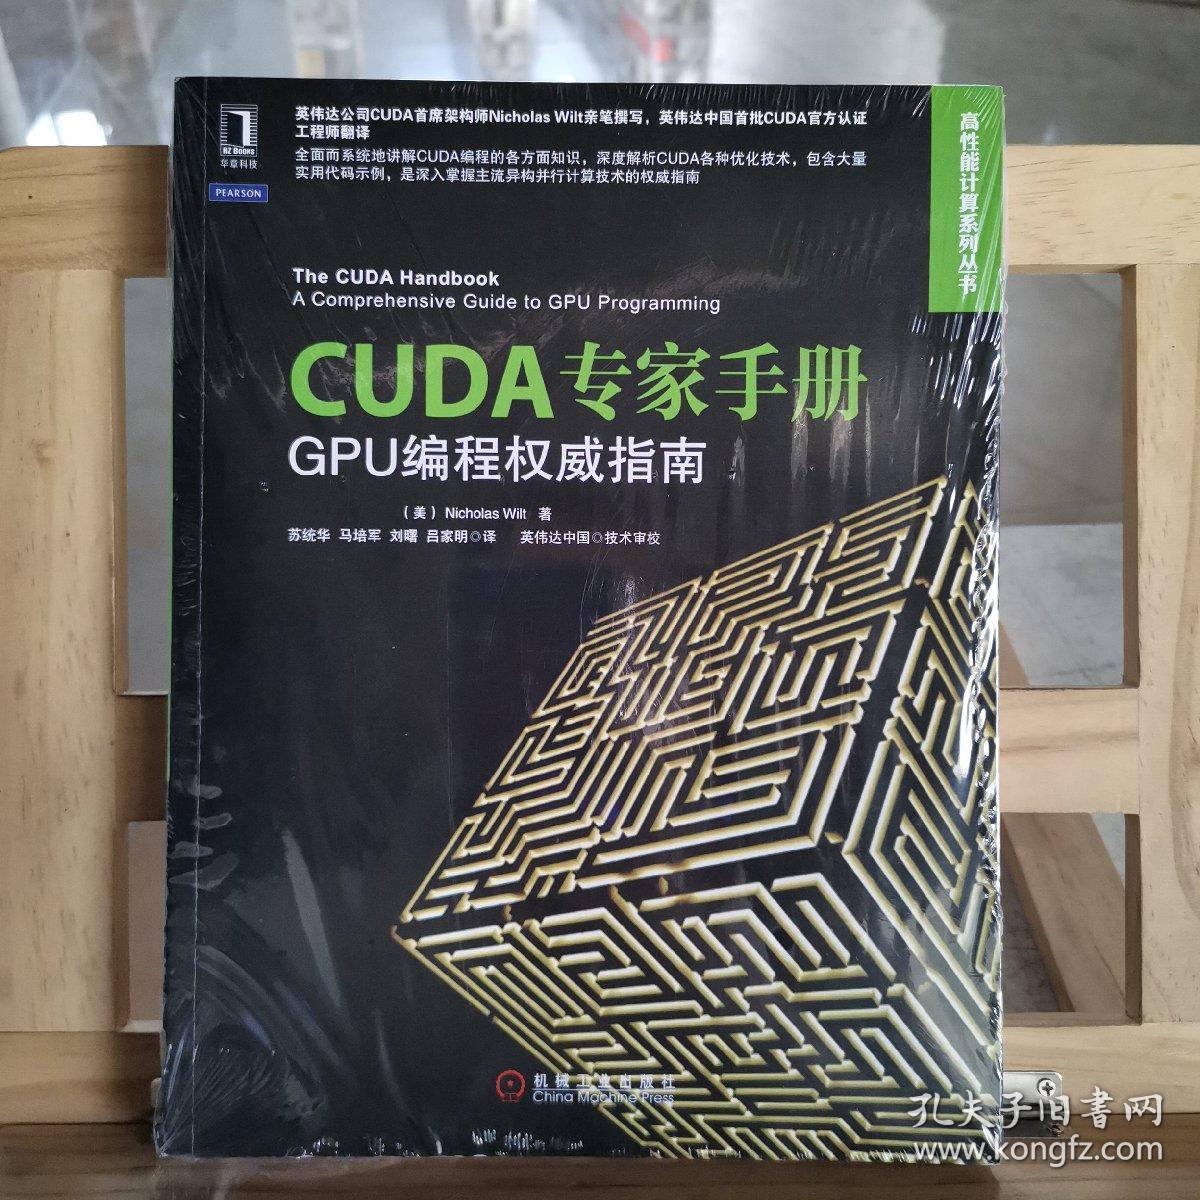 CUDA专家手册:GPU编程权威指南